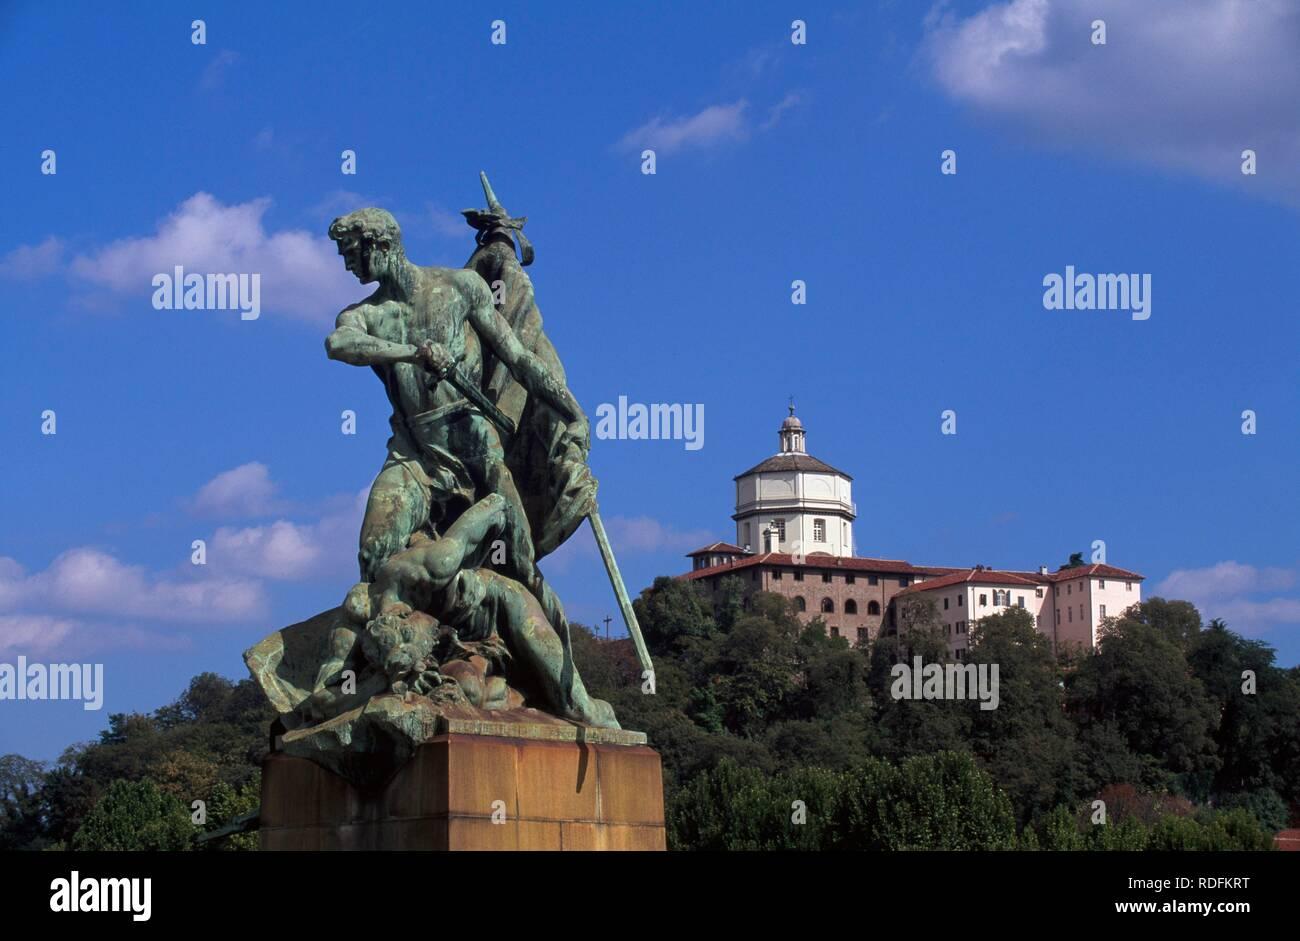 Statue on the bridge Ponte Umberto I and Church of Santa Maria del Monte in Turin, Torino, Piedmont, Italy, Europe - Stock Image